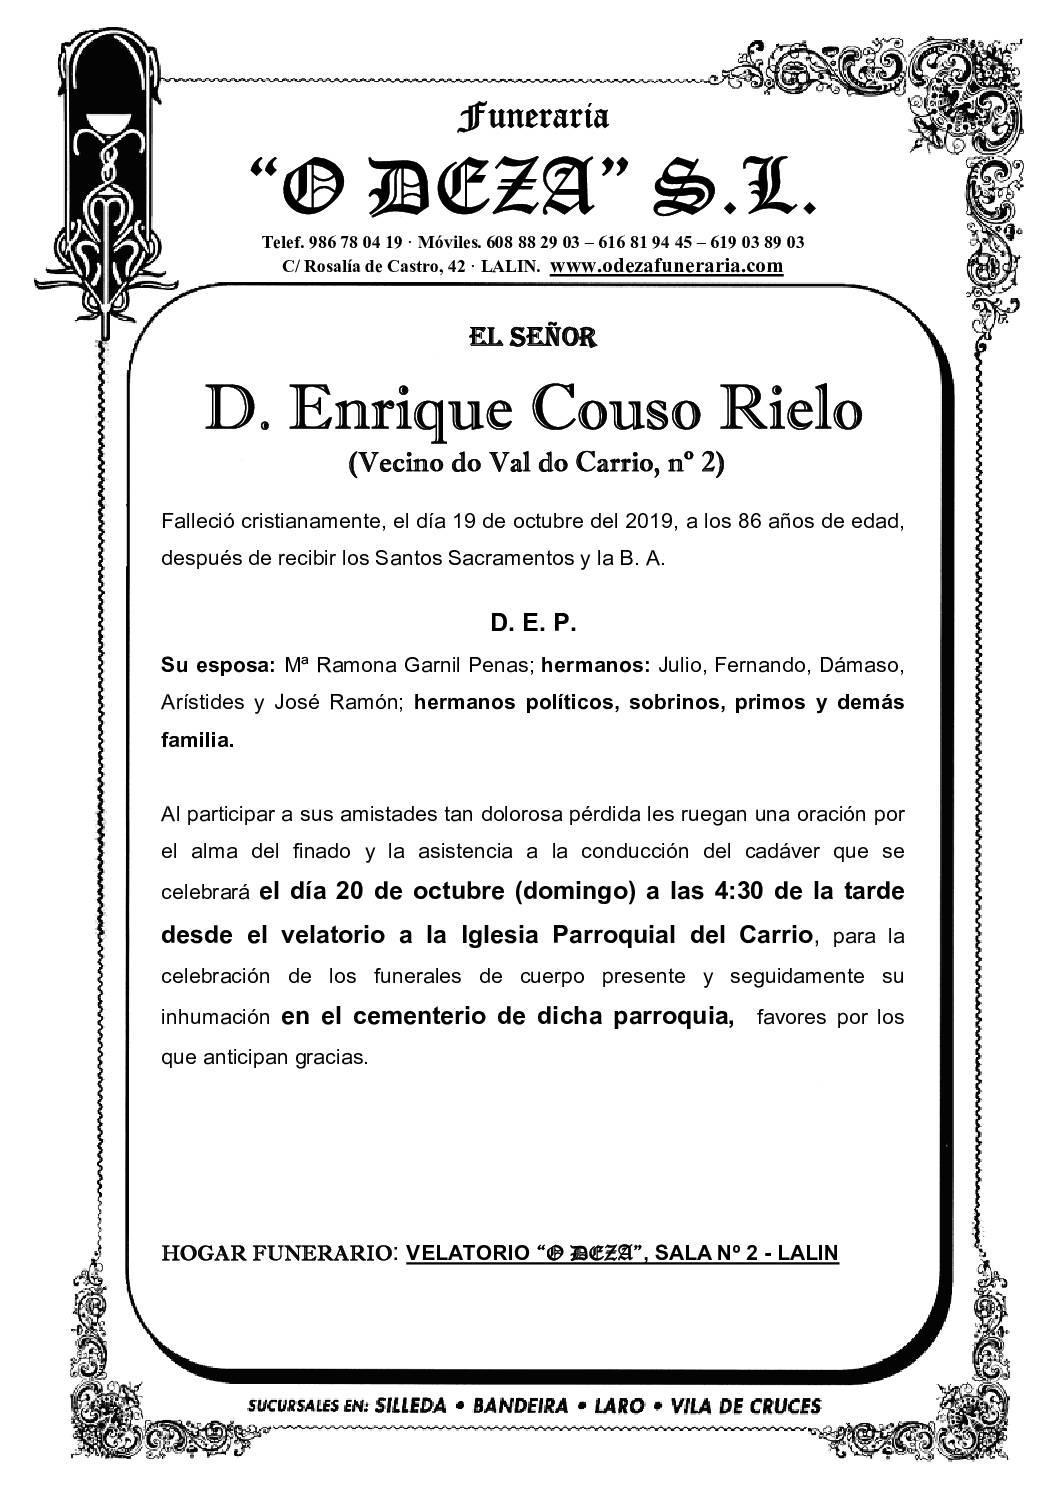 D. ENRIQUE COUSO RIELO